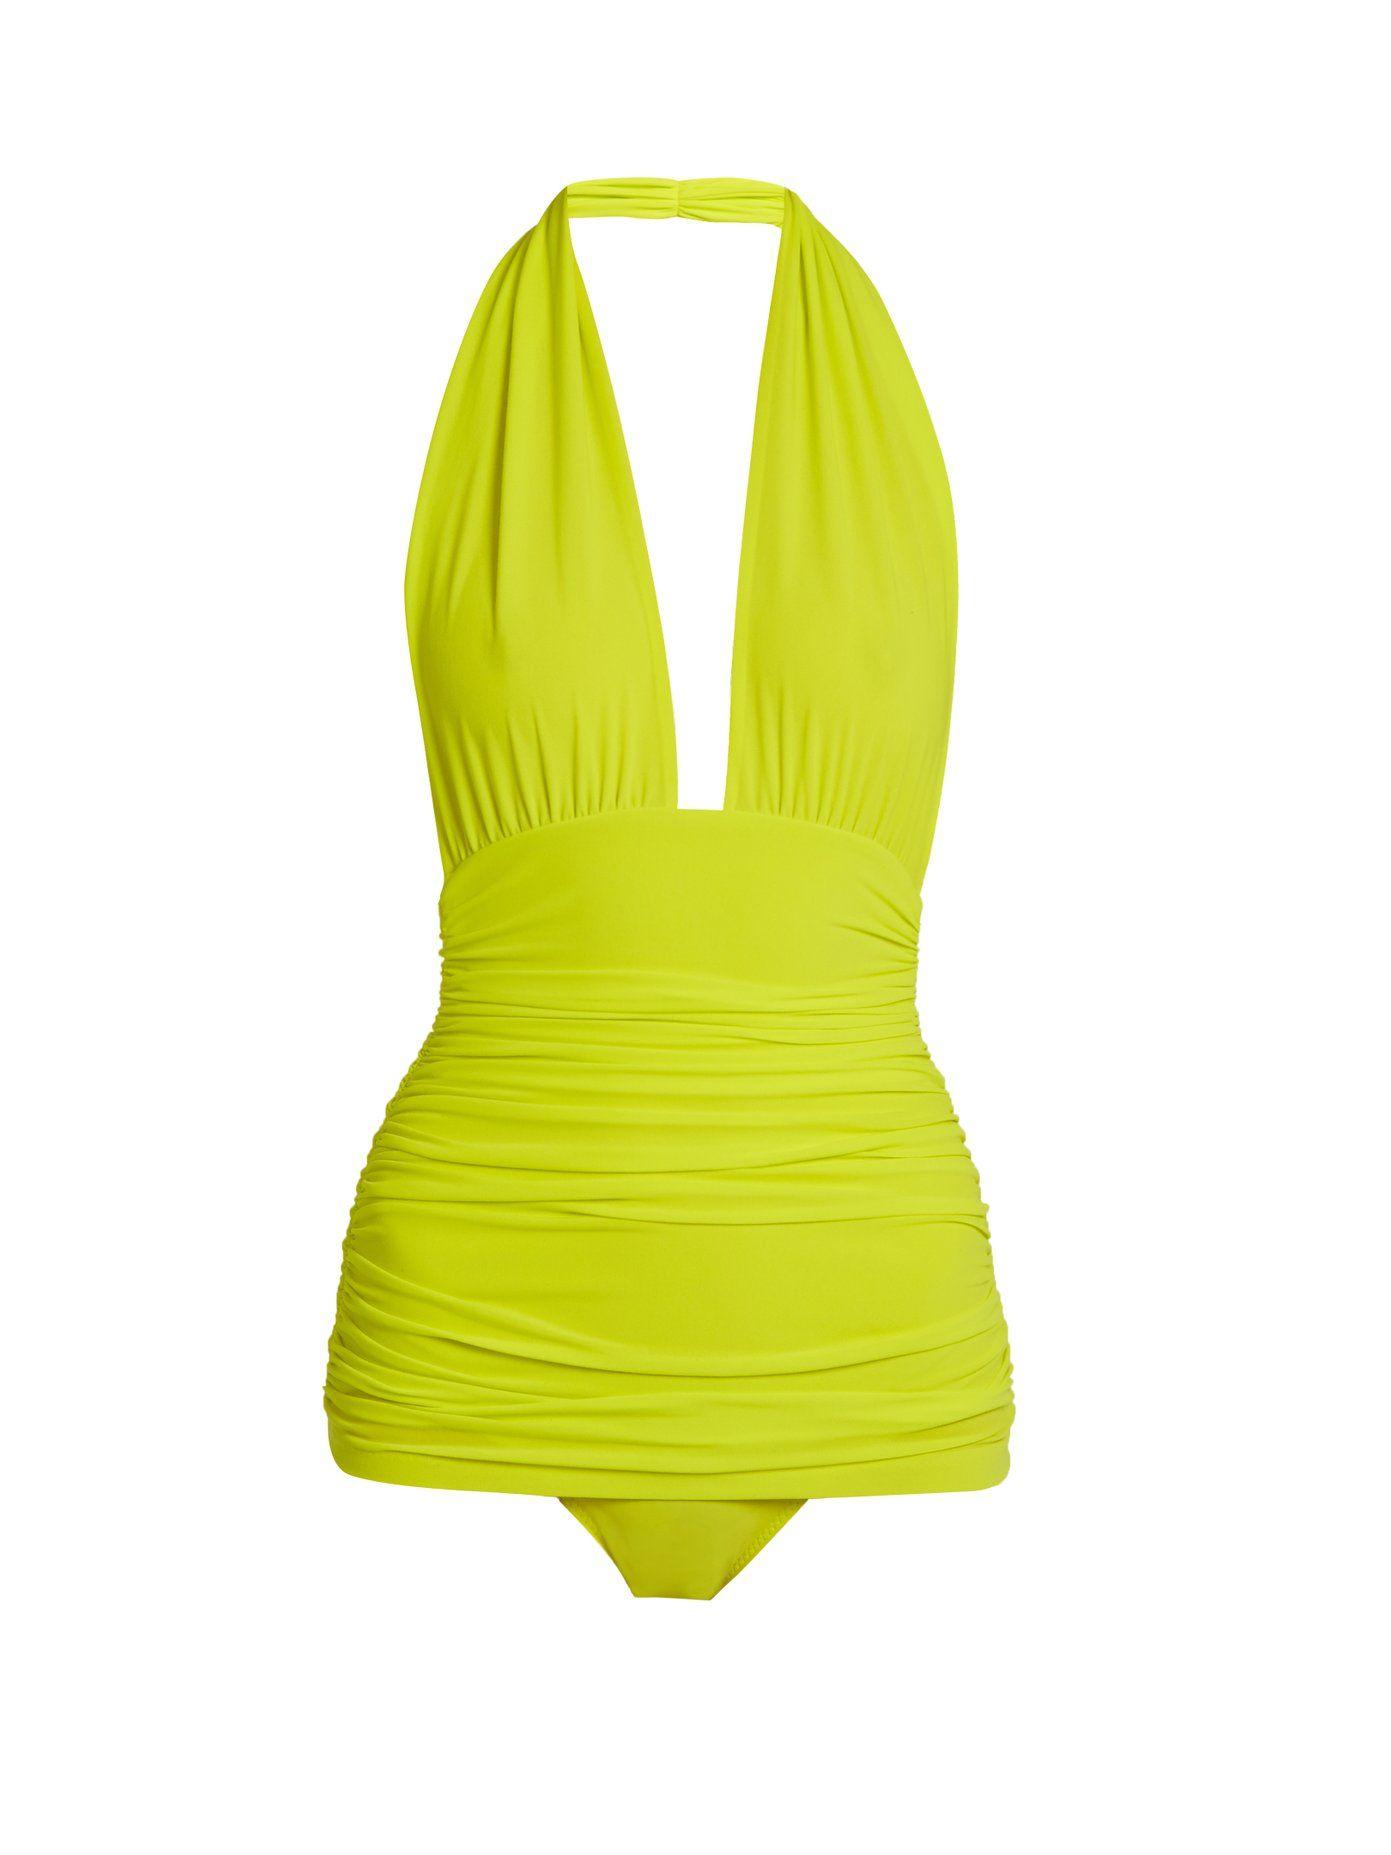 72c6b7f20b Bill Halter swimsuit | Norma Kamali | MATCHESFASHION.COM US ...